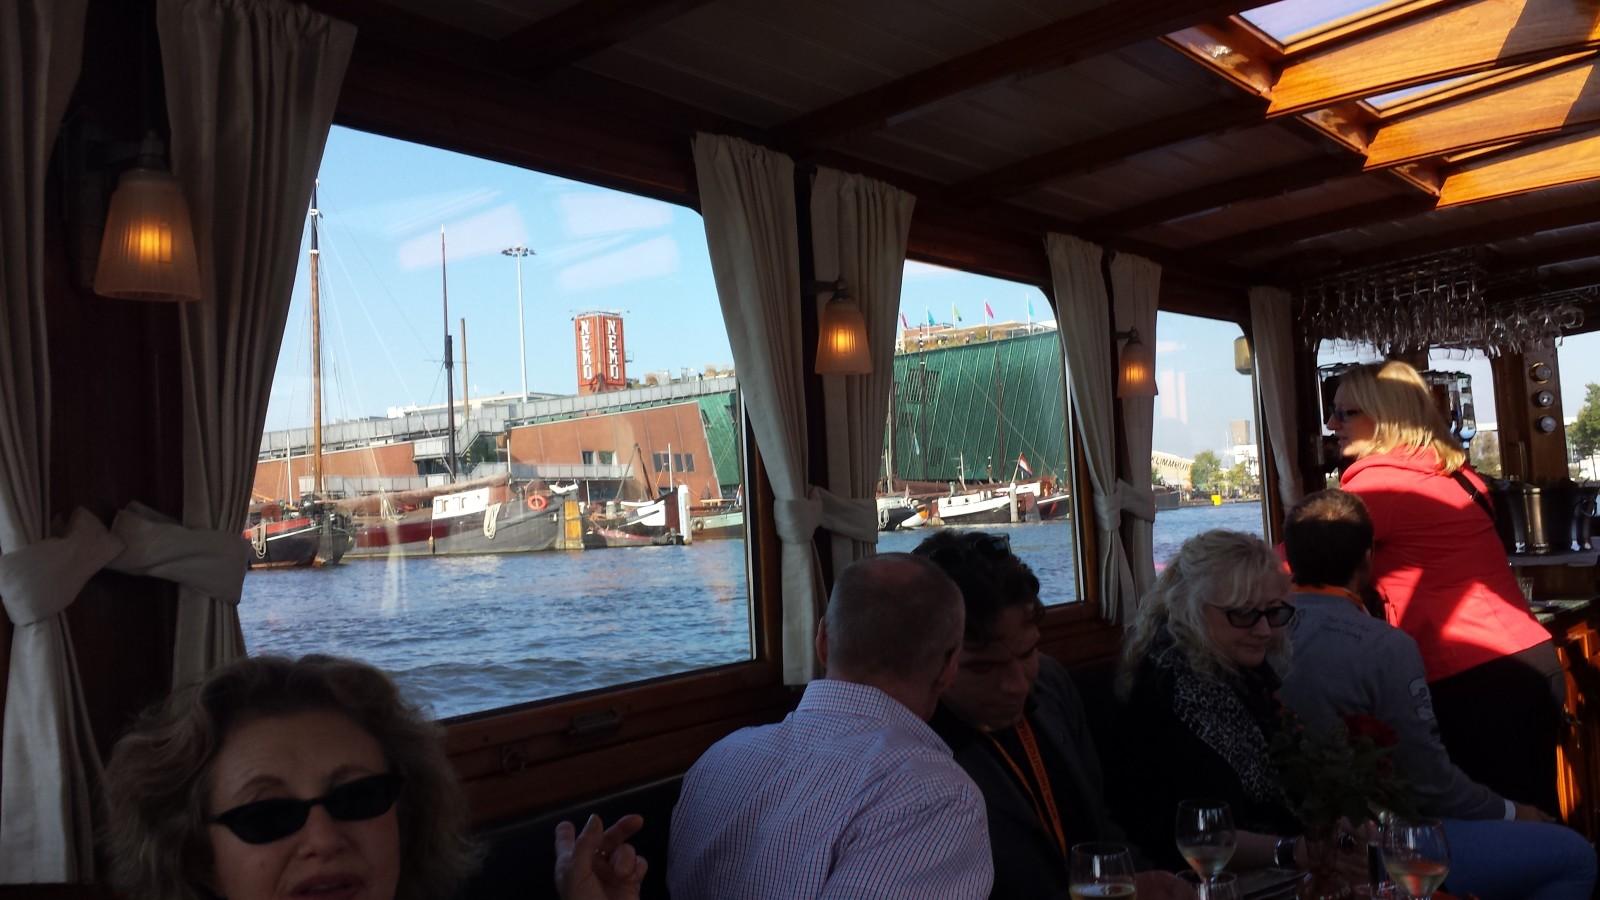 20141003_123124 The Bell Epoque Salon Boat